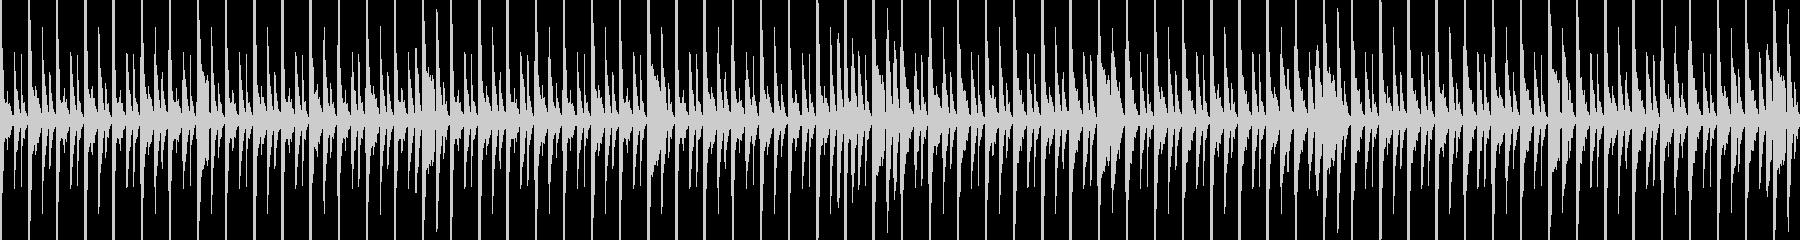 (Loop)ハウスのリズムトラックの未再生の波形